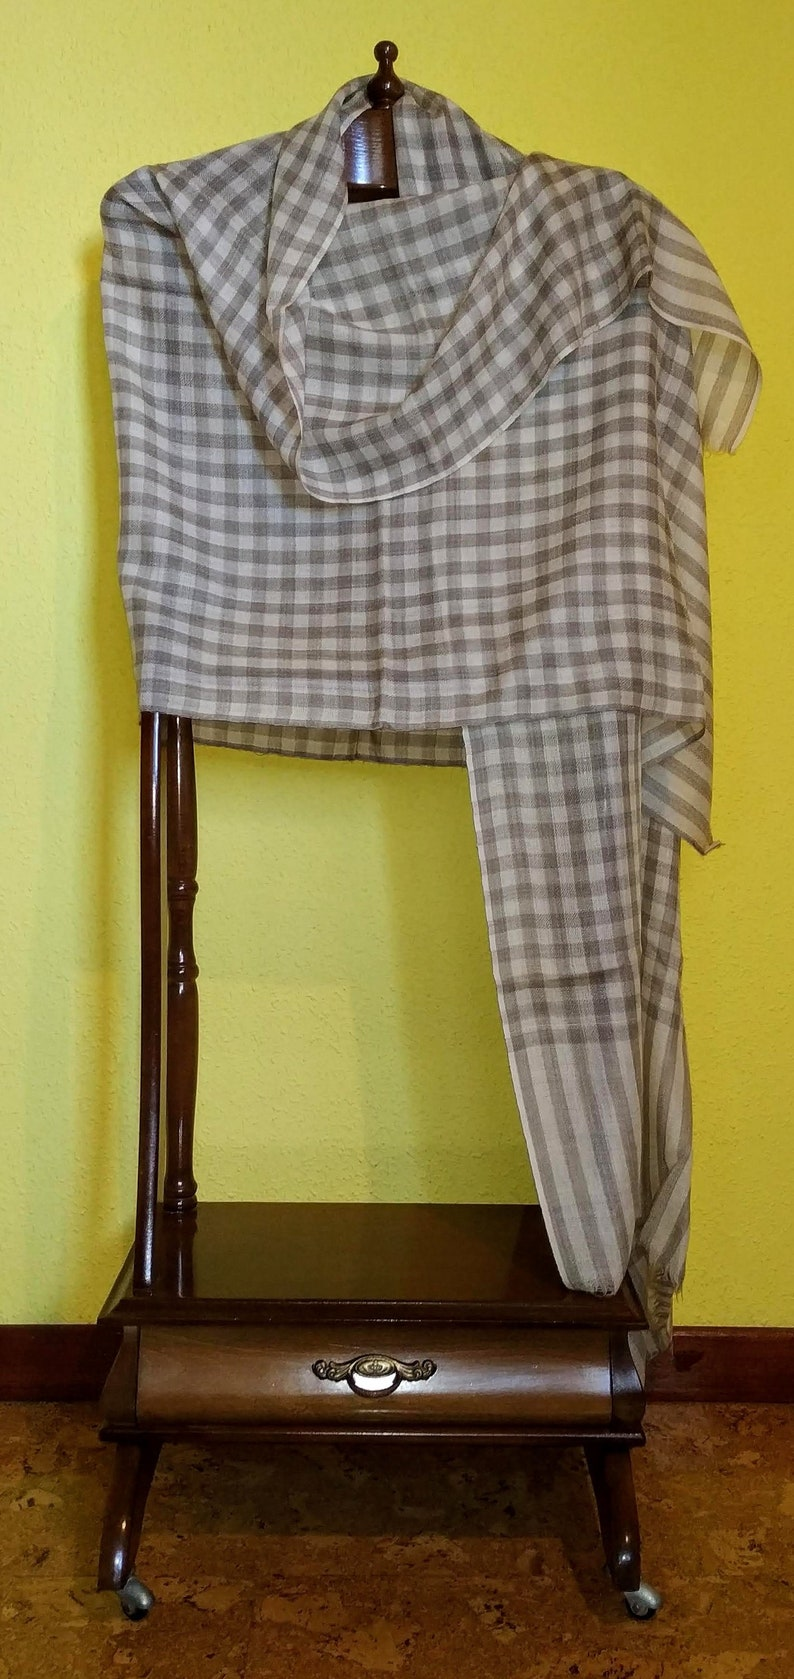 424eaa34dfa7b Real pashmina Kashmir shawl in beige and grey. Indian pashmina | Etsy